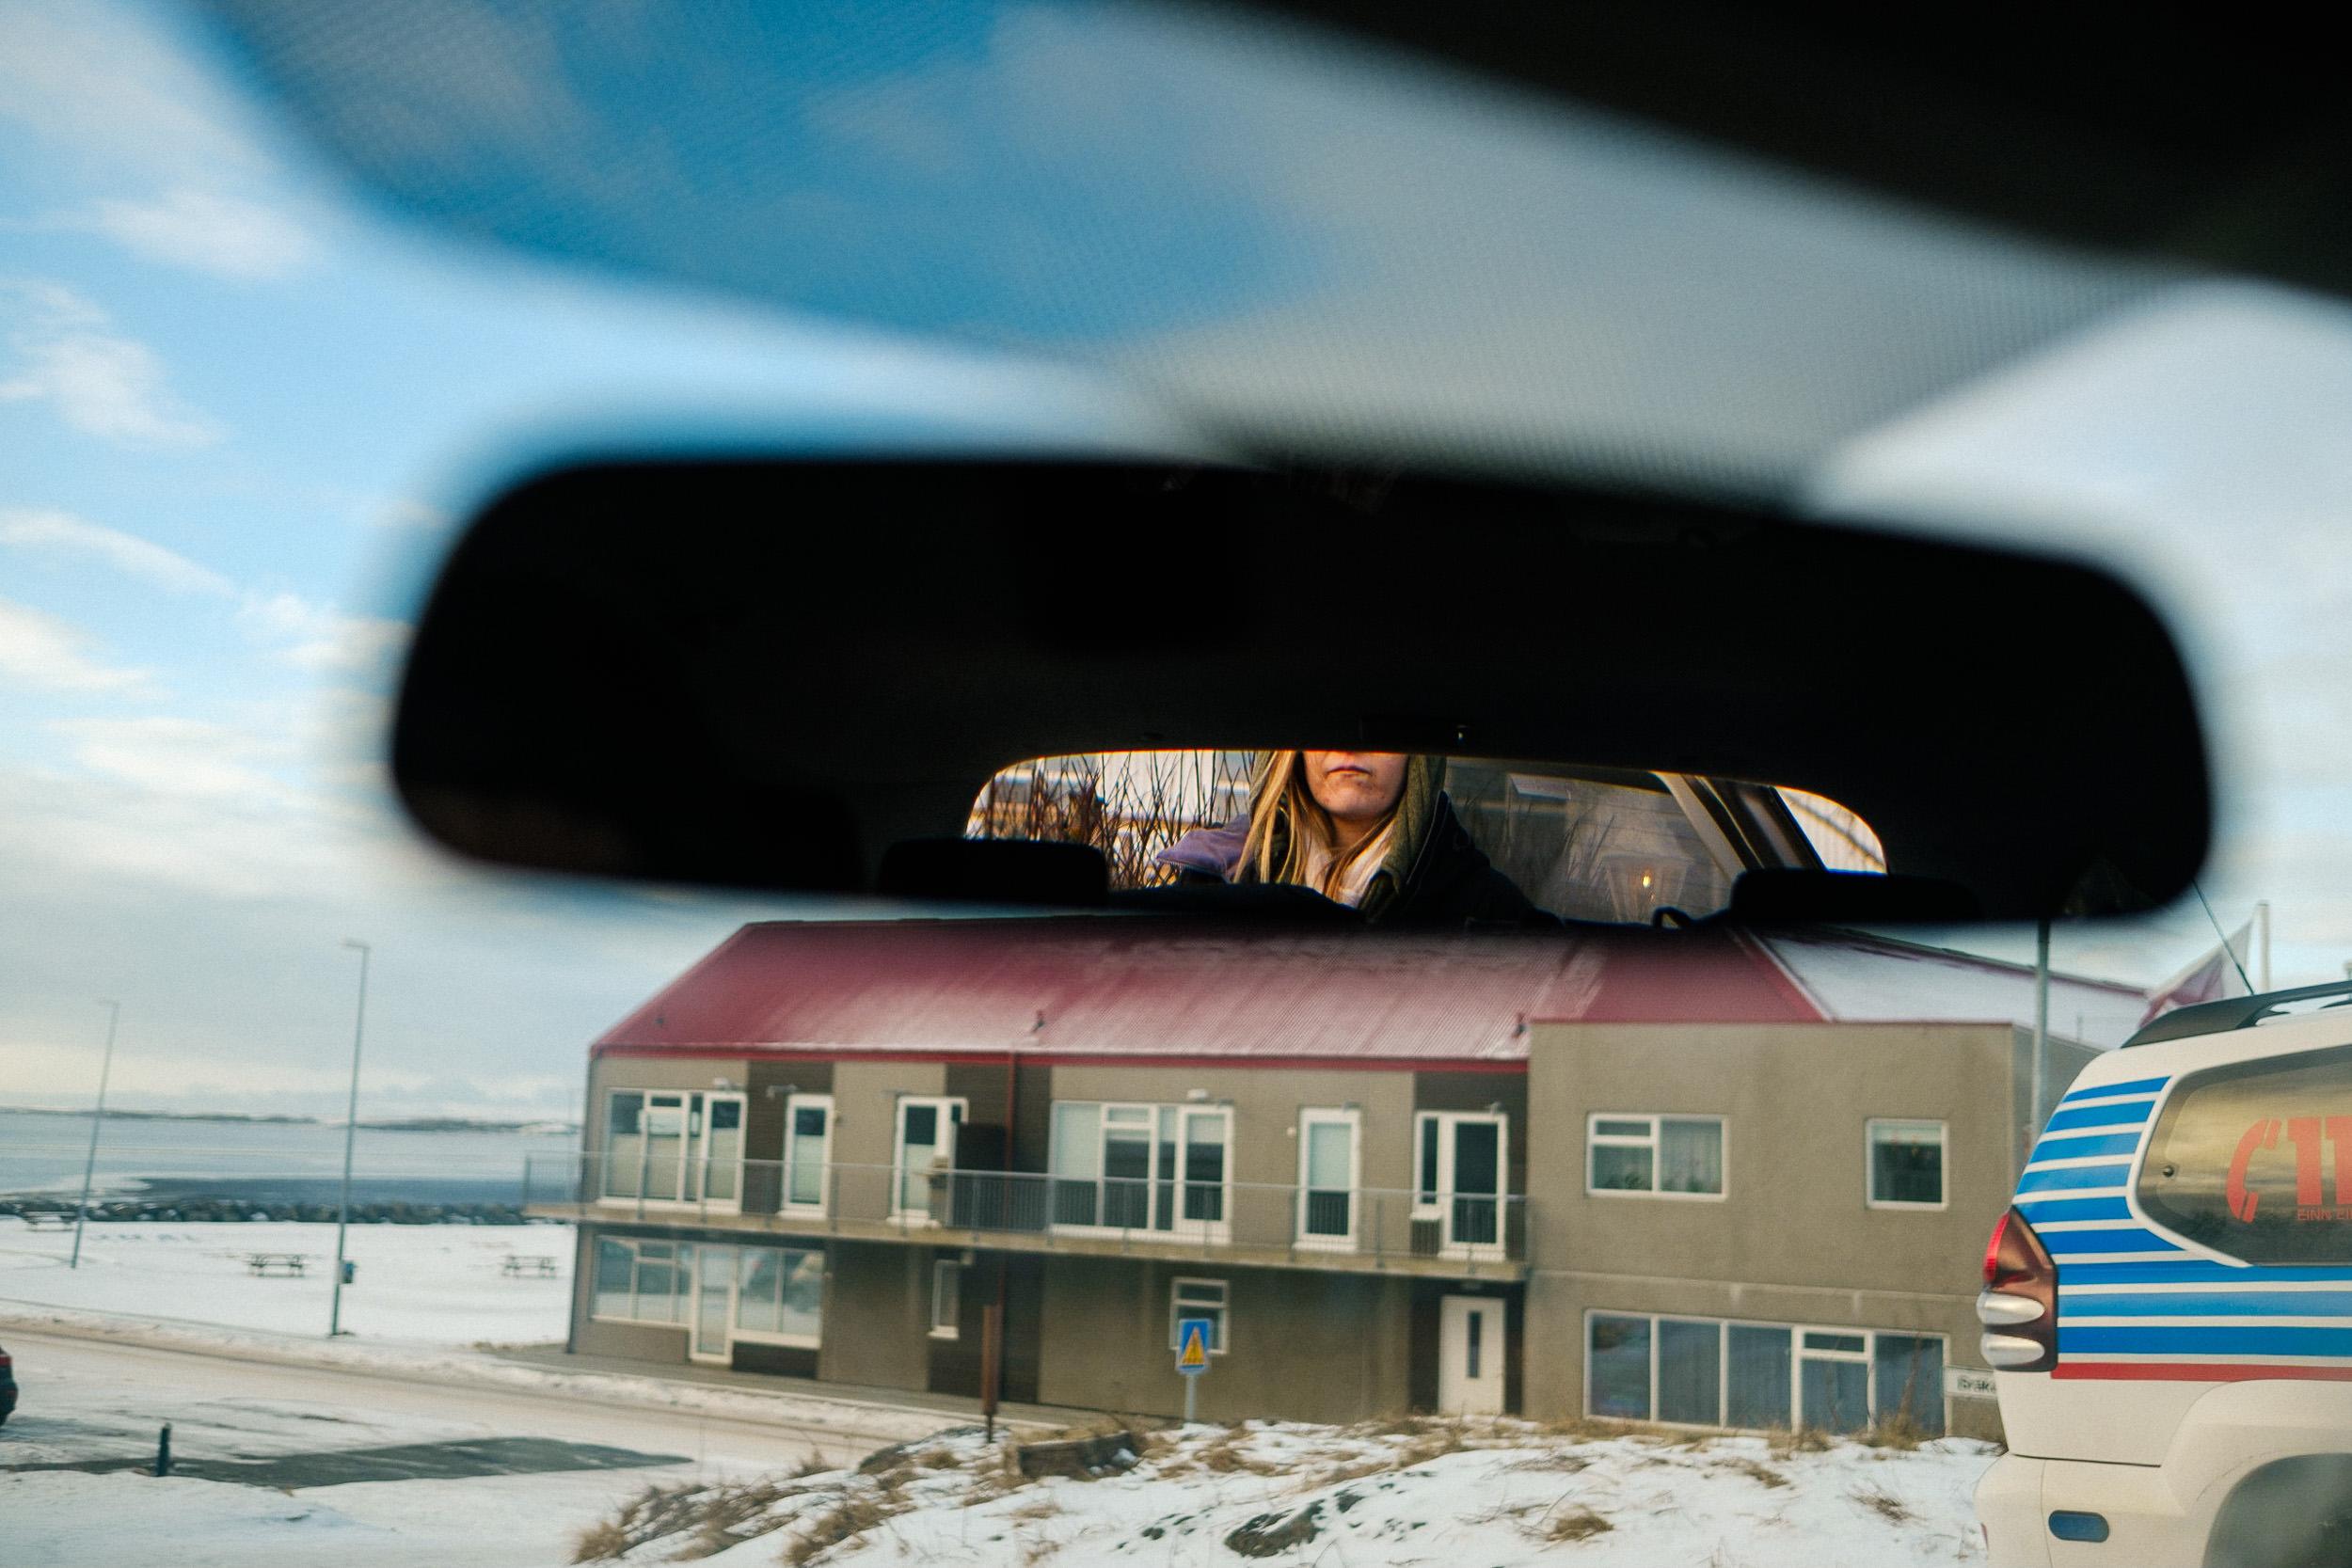 Collective_Wander_Iceland_Photographers_Trip_038.jpg